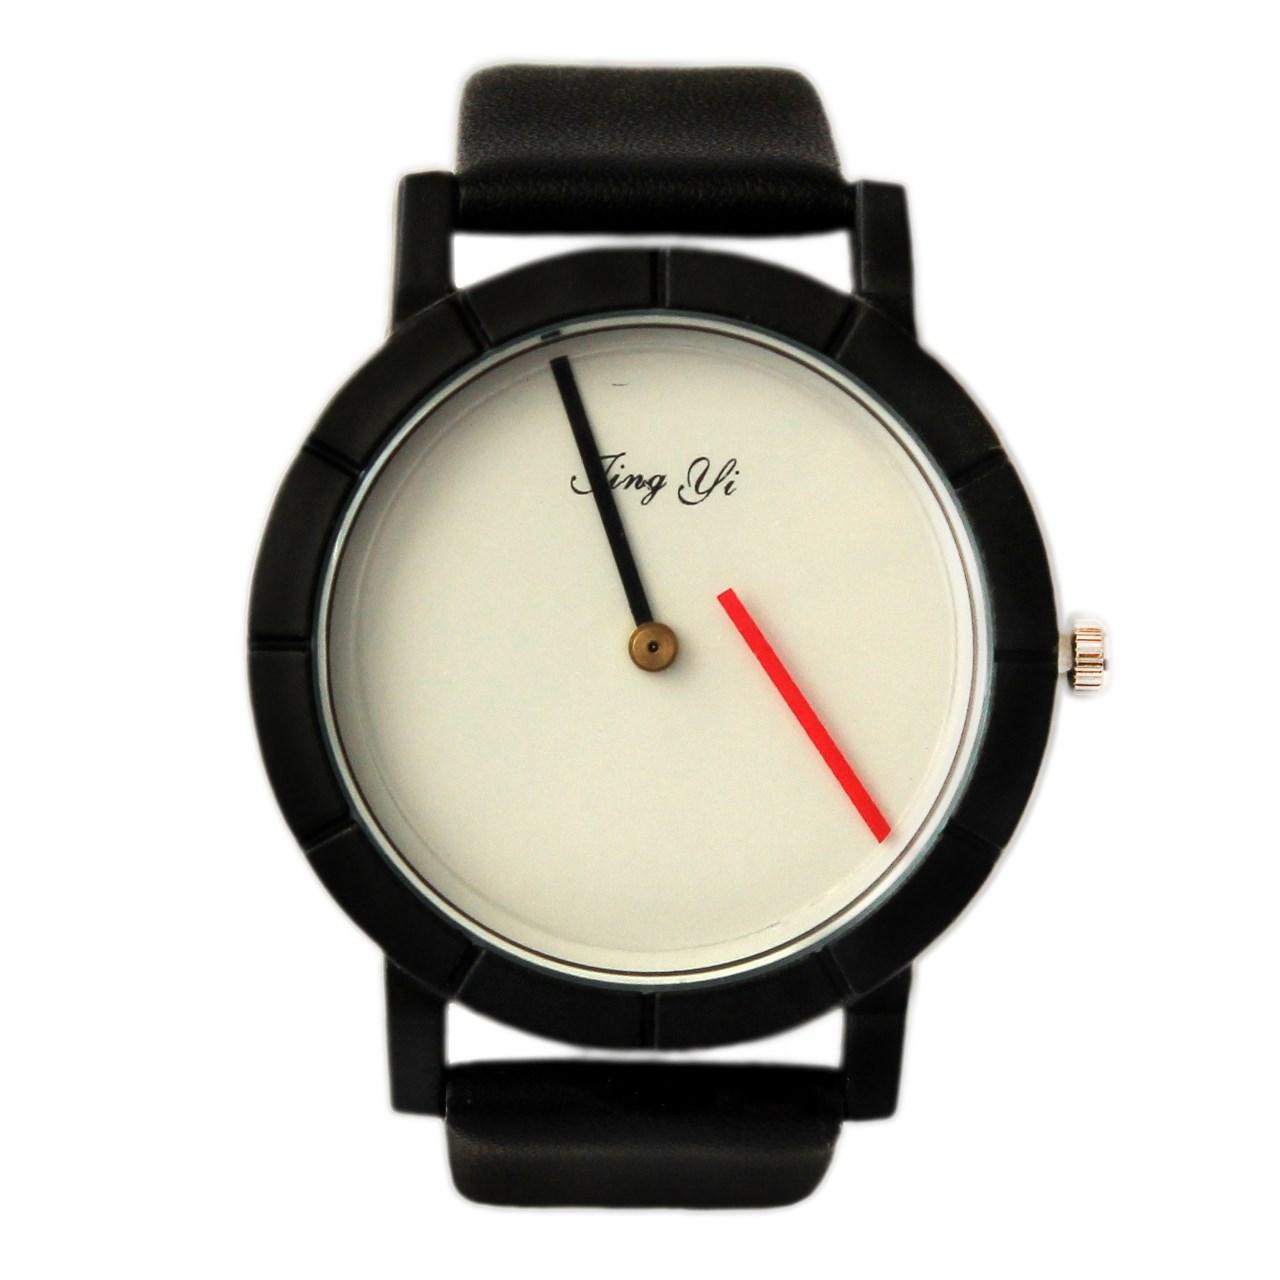 خرید ساعت مچی عقربه ای مردانه مدل Jing Yi